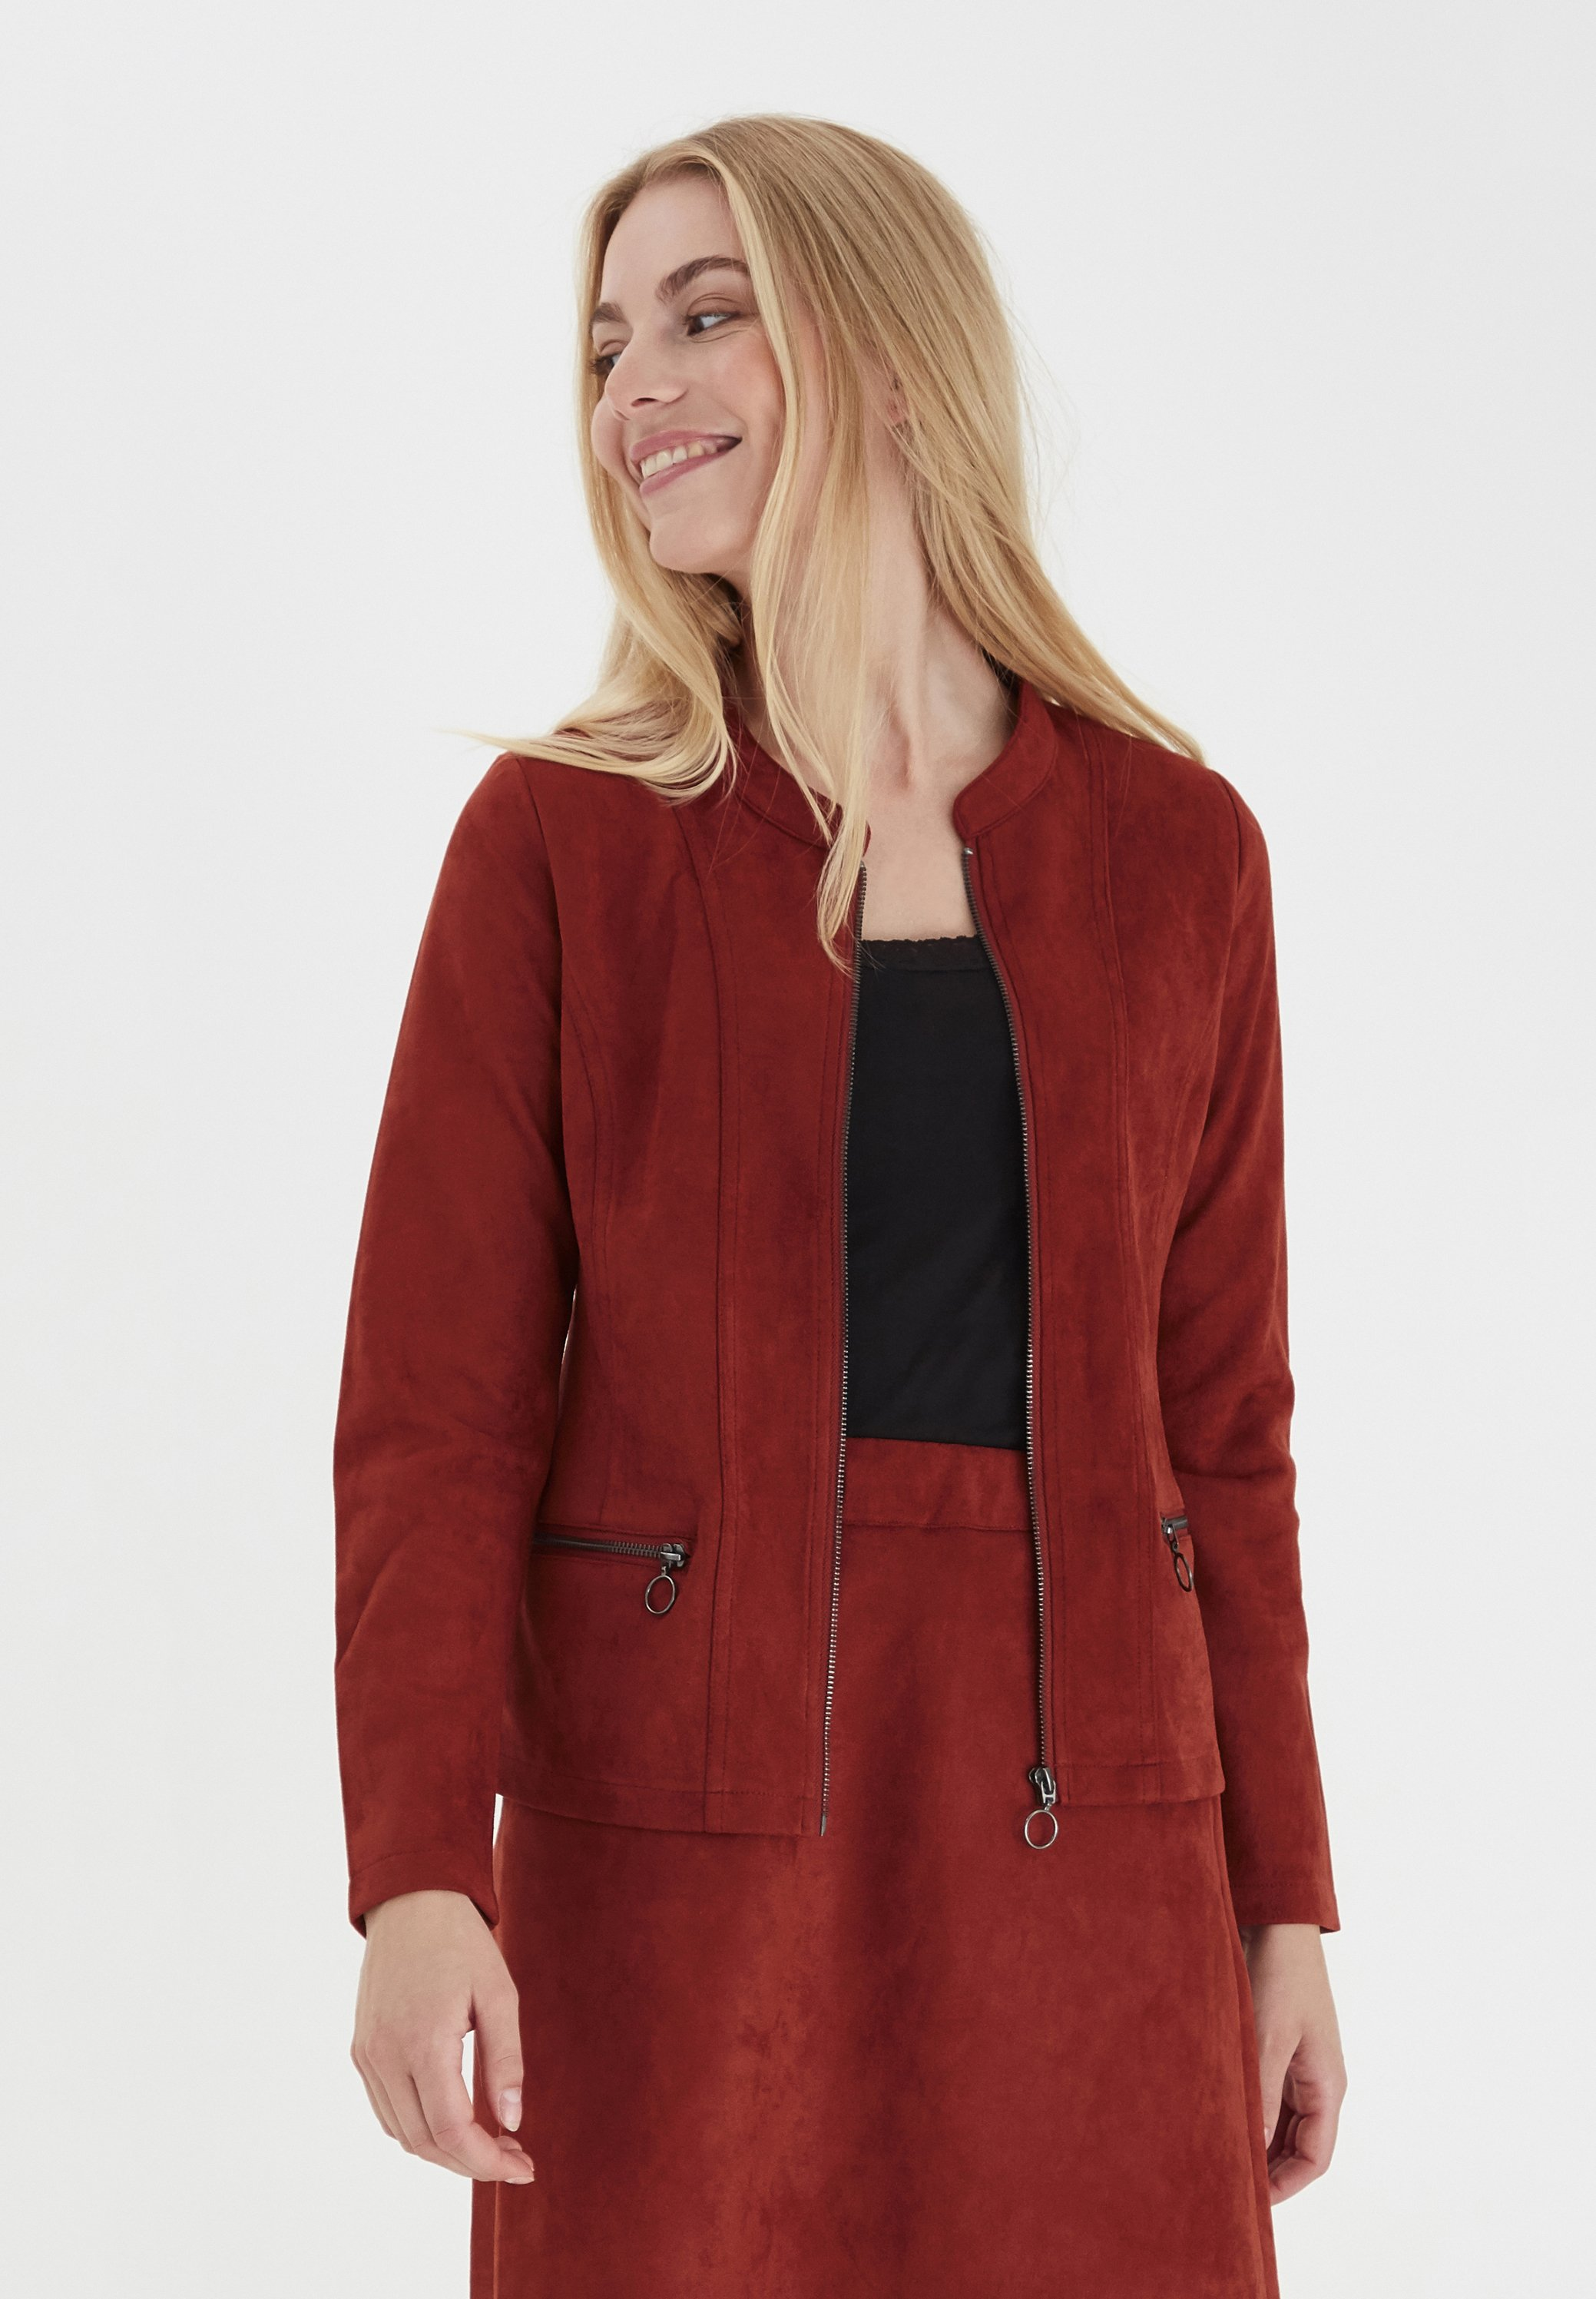 Wholesale Quality Women's Clothing Fransa FRLASUEDE Faux leather jacket burnt henna cSvkptIDq